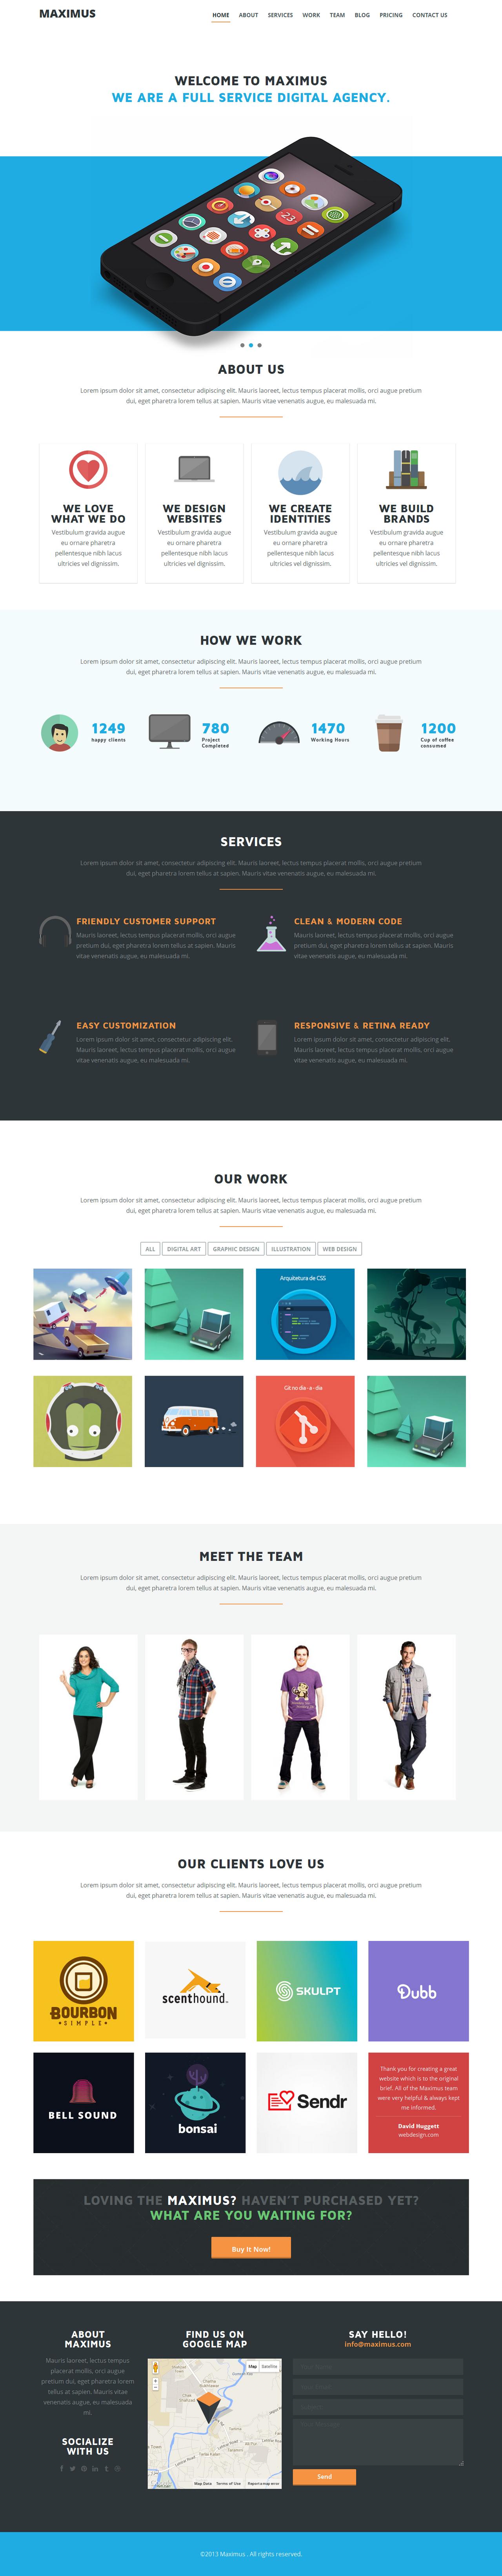 MAXIMUS Responsive Onepage Theme by webdesigngeek